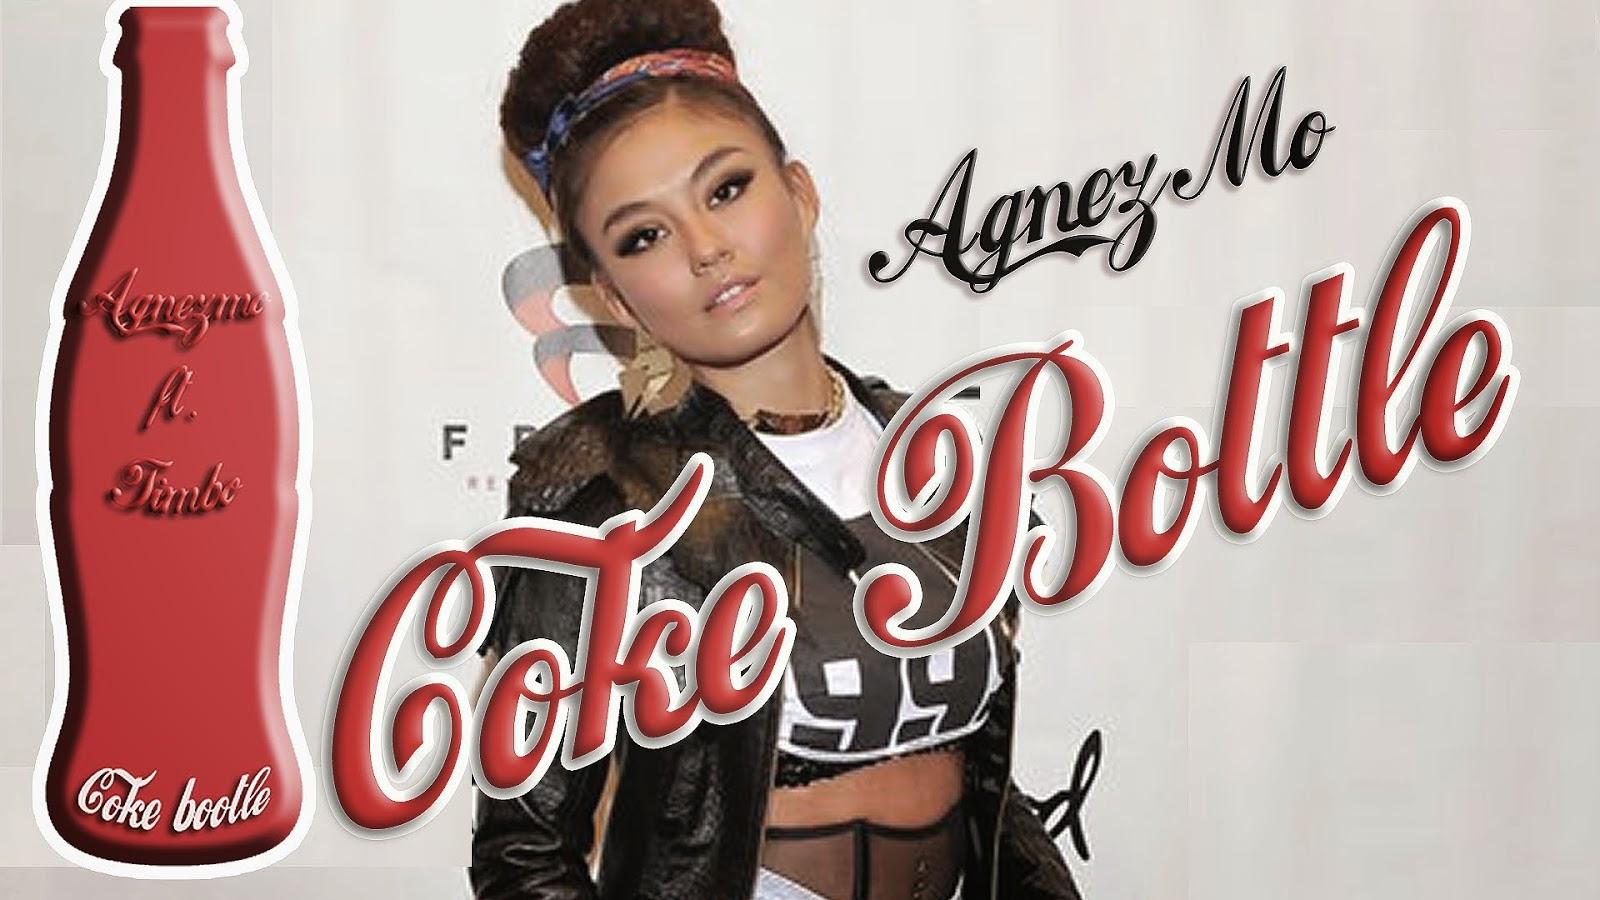 Download lagu terbaru Agnes Monica ft Timbaland - Coke Bottle.mp3